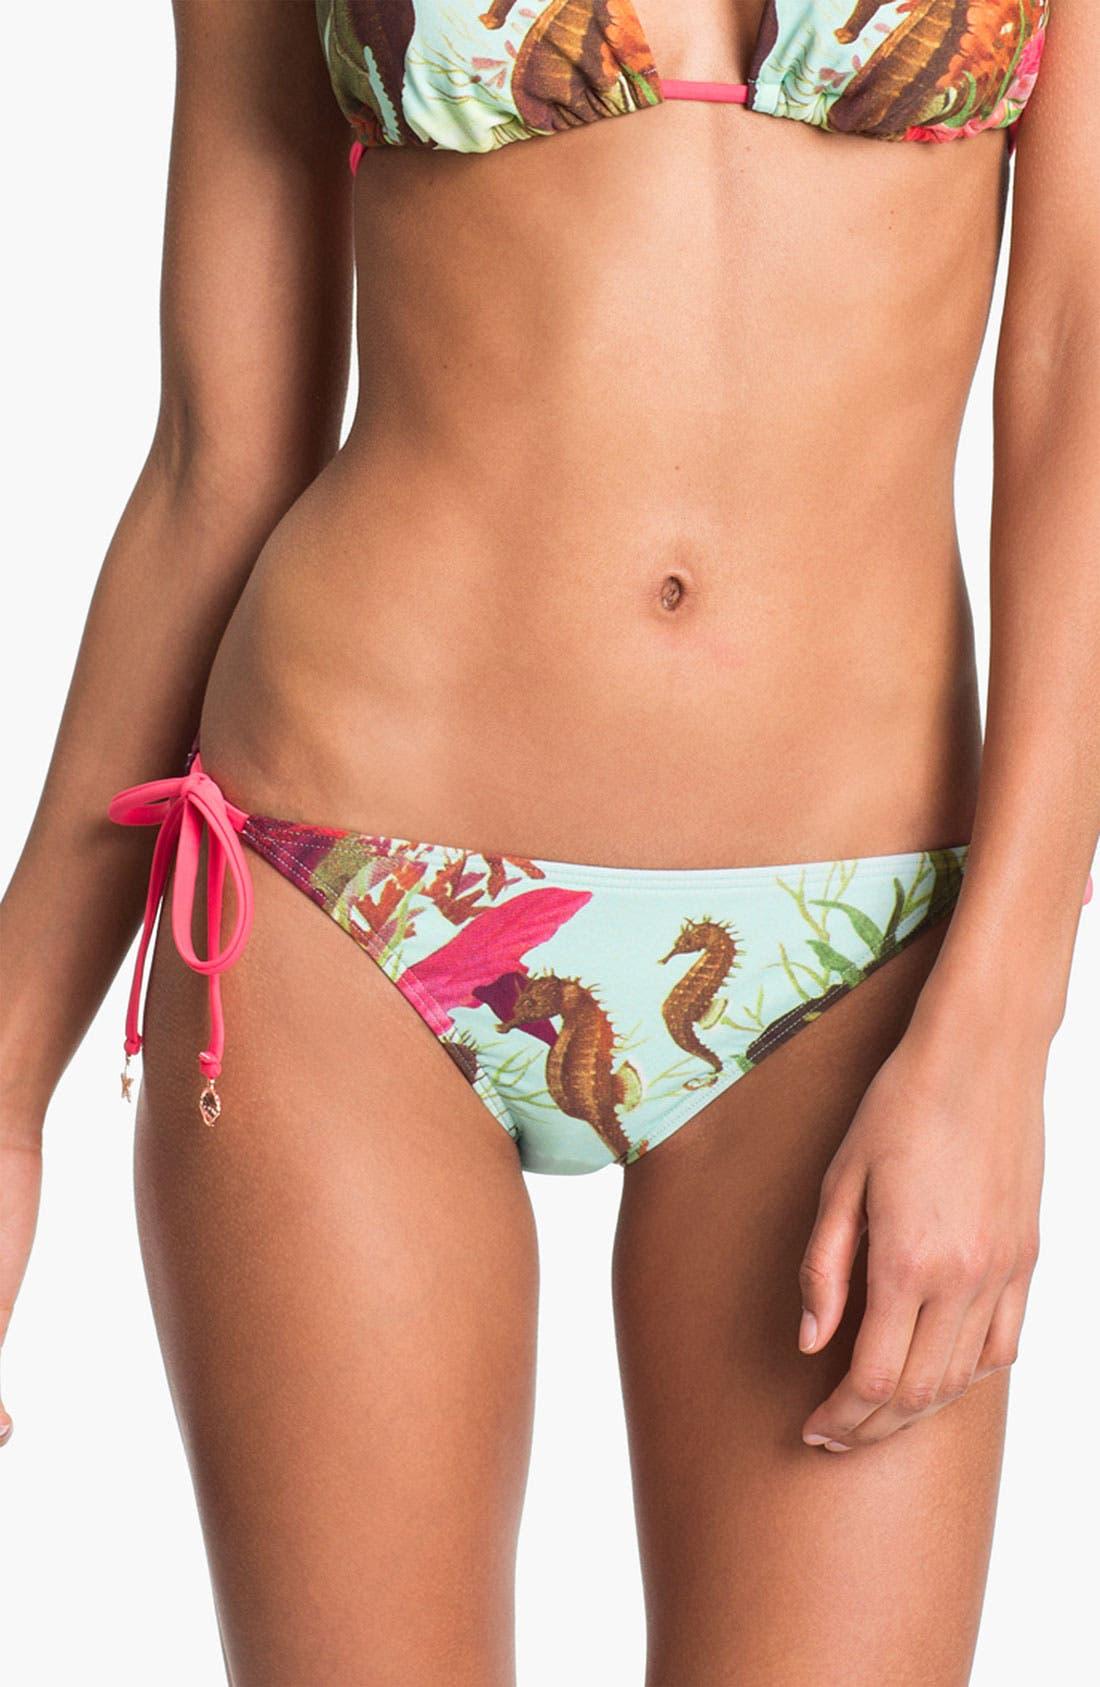 Alternate Image 1 Selected - Ted Baker London 'Under the Sea' Bikini Bottoms